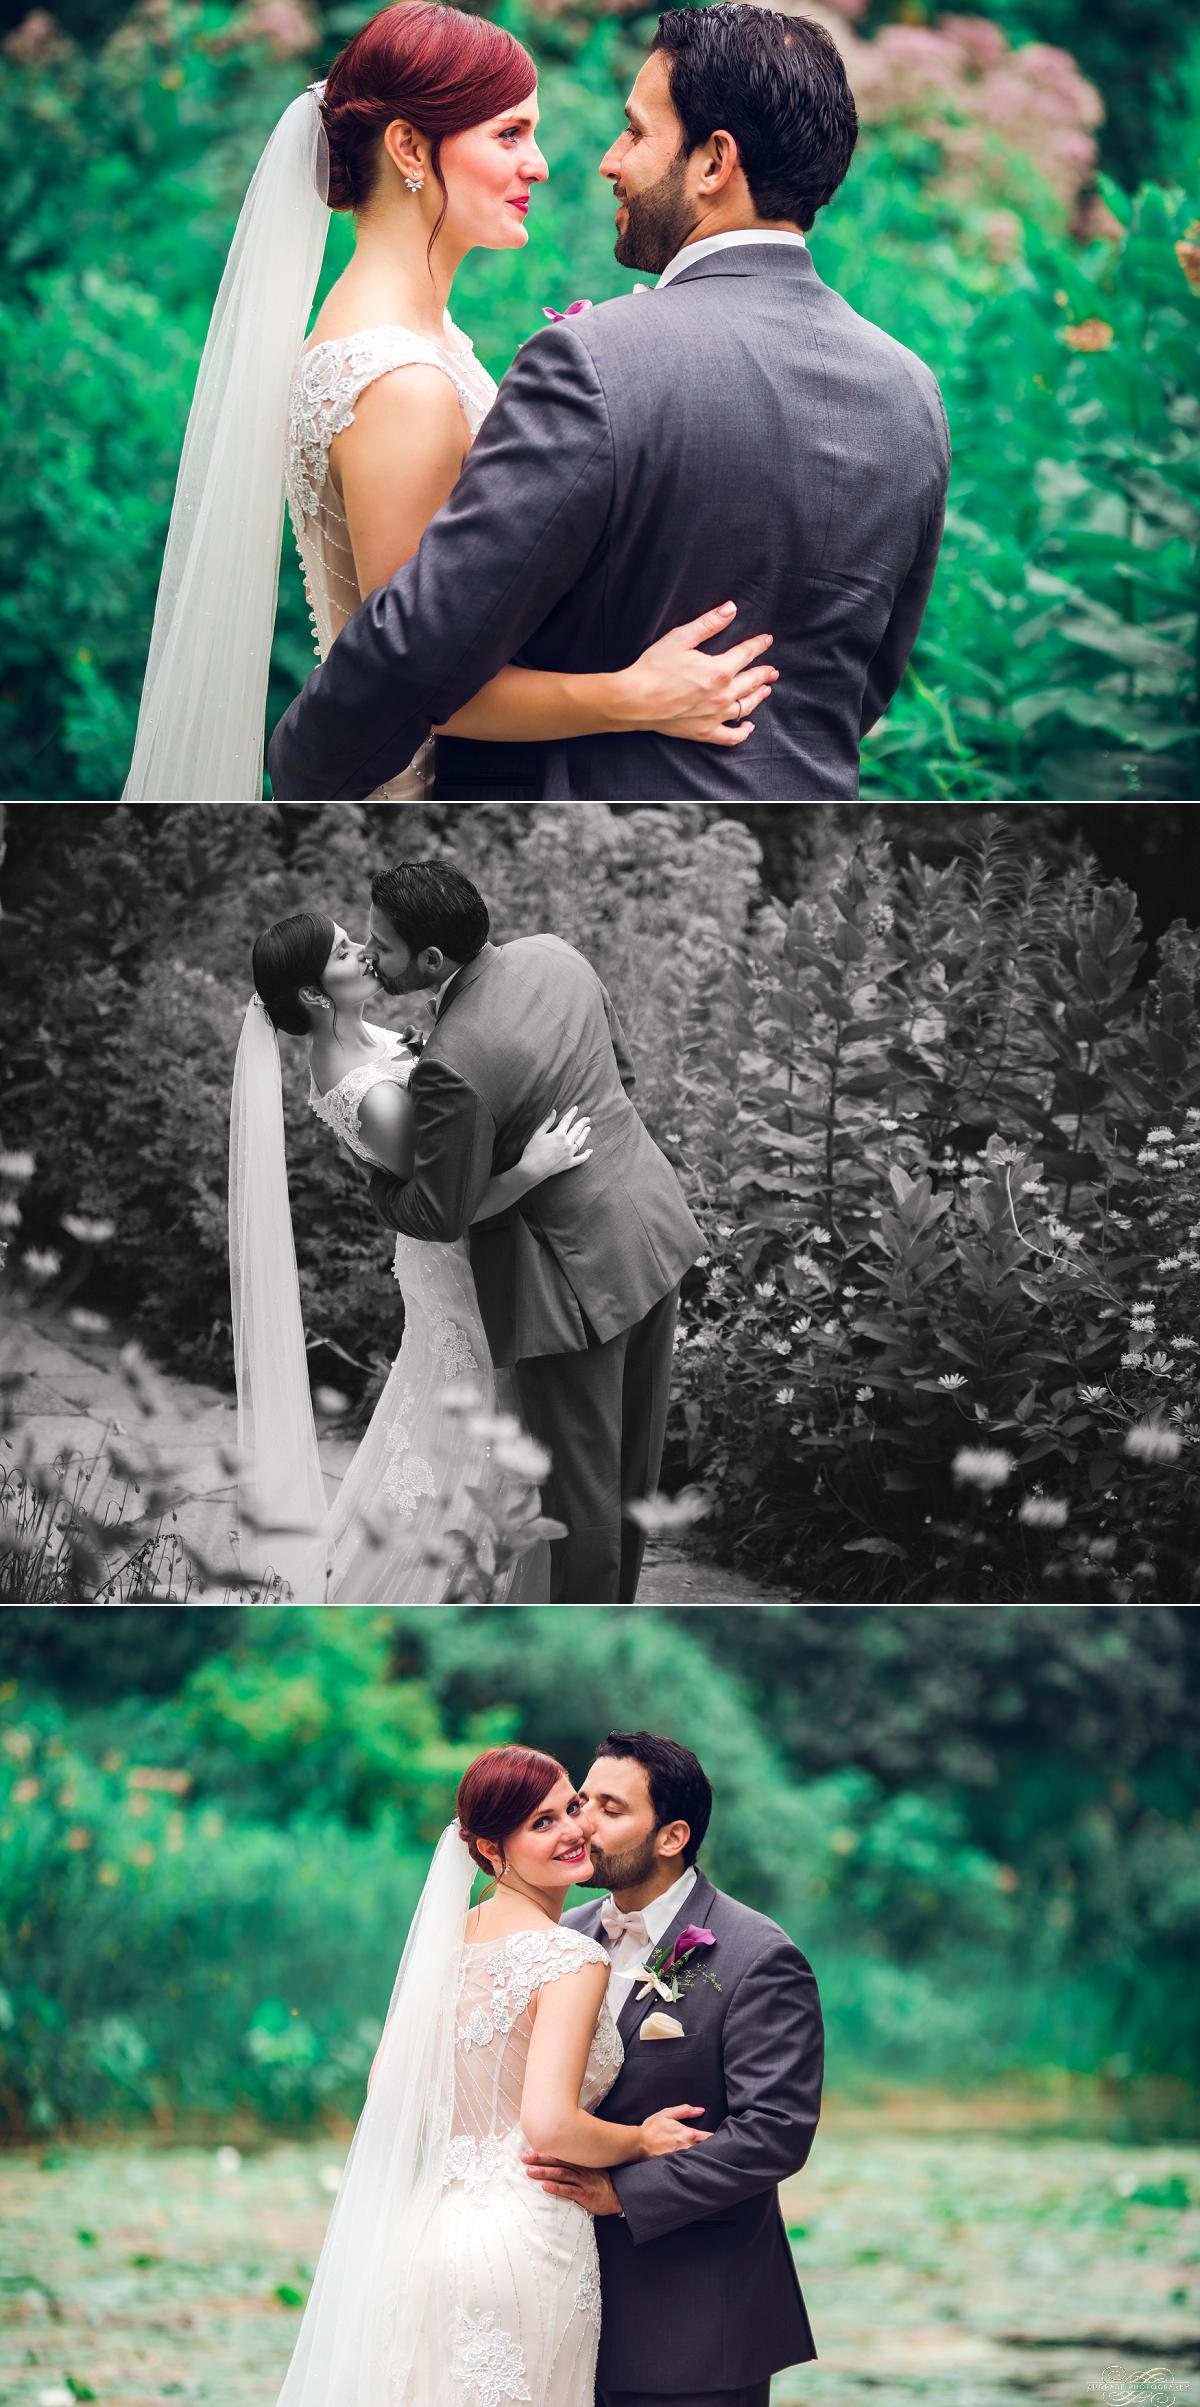 Jillian & Felix Chicago Wedding Photography at Oak & Char Trump Tower and Chicago Athletic Association_0030.jpg